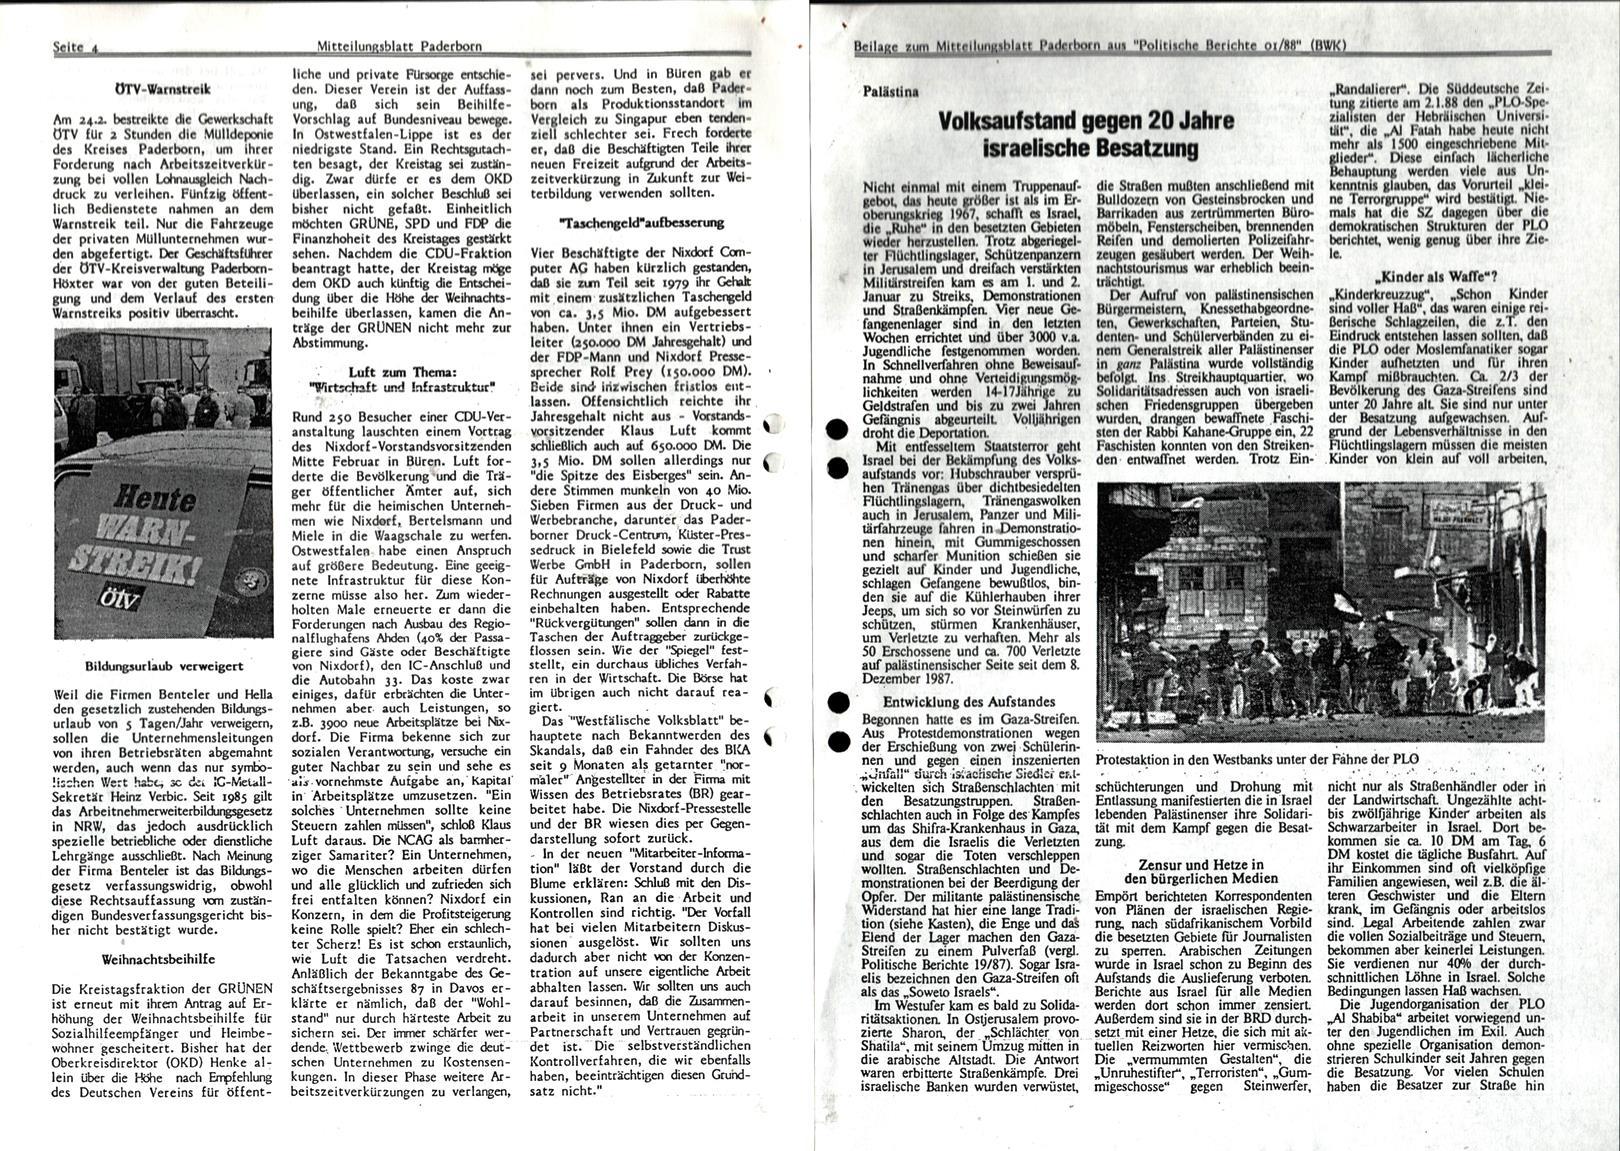 Paderborn_BWK_Mitteilungsblatt_19880316_003